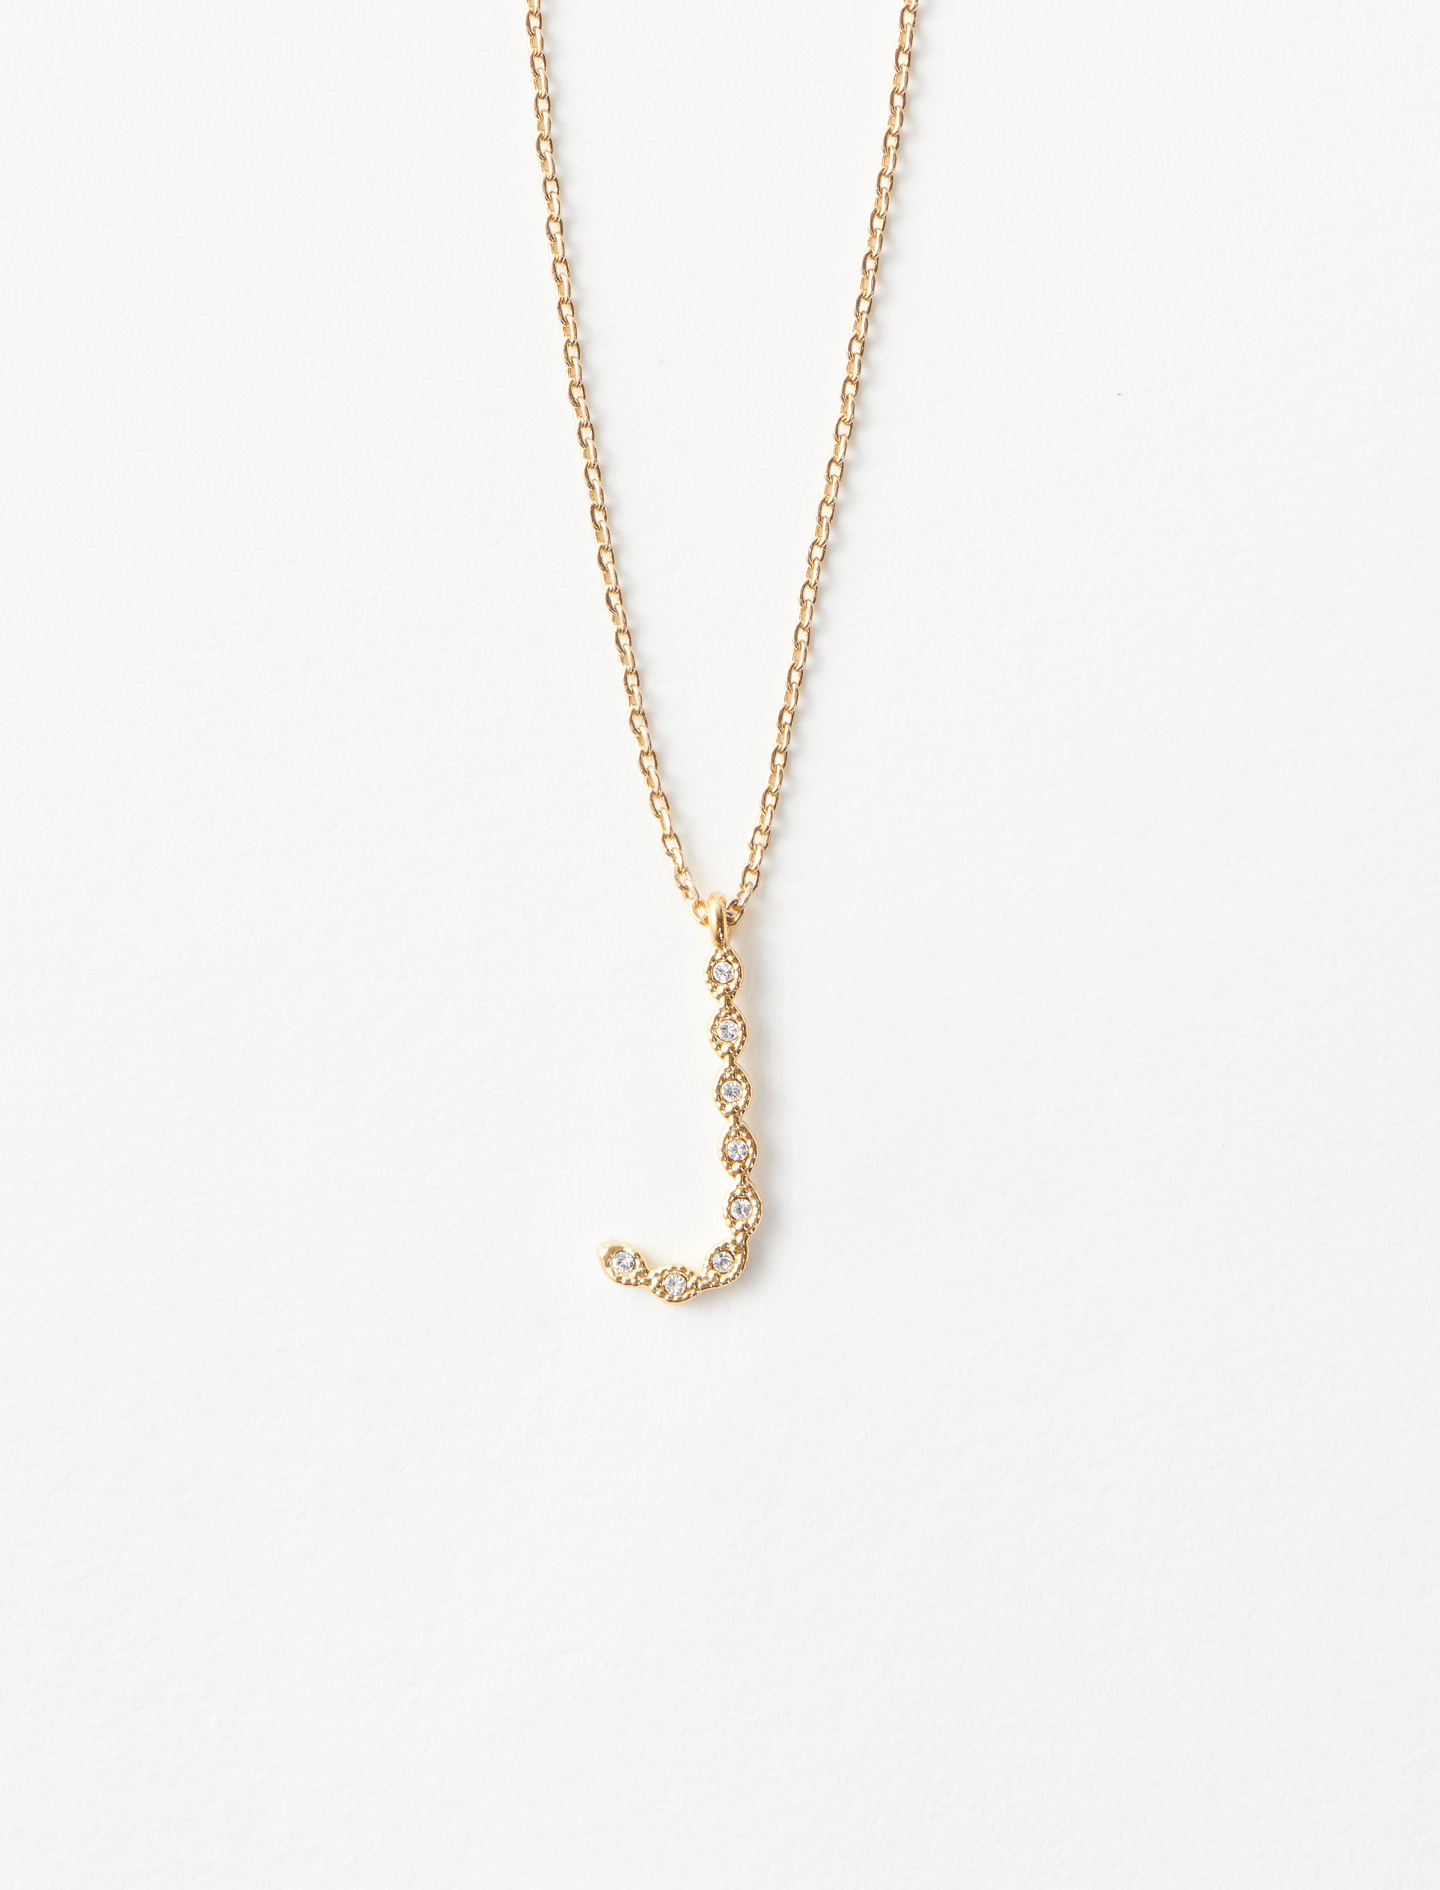 Rhinestone J necklace - Gold